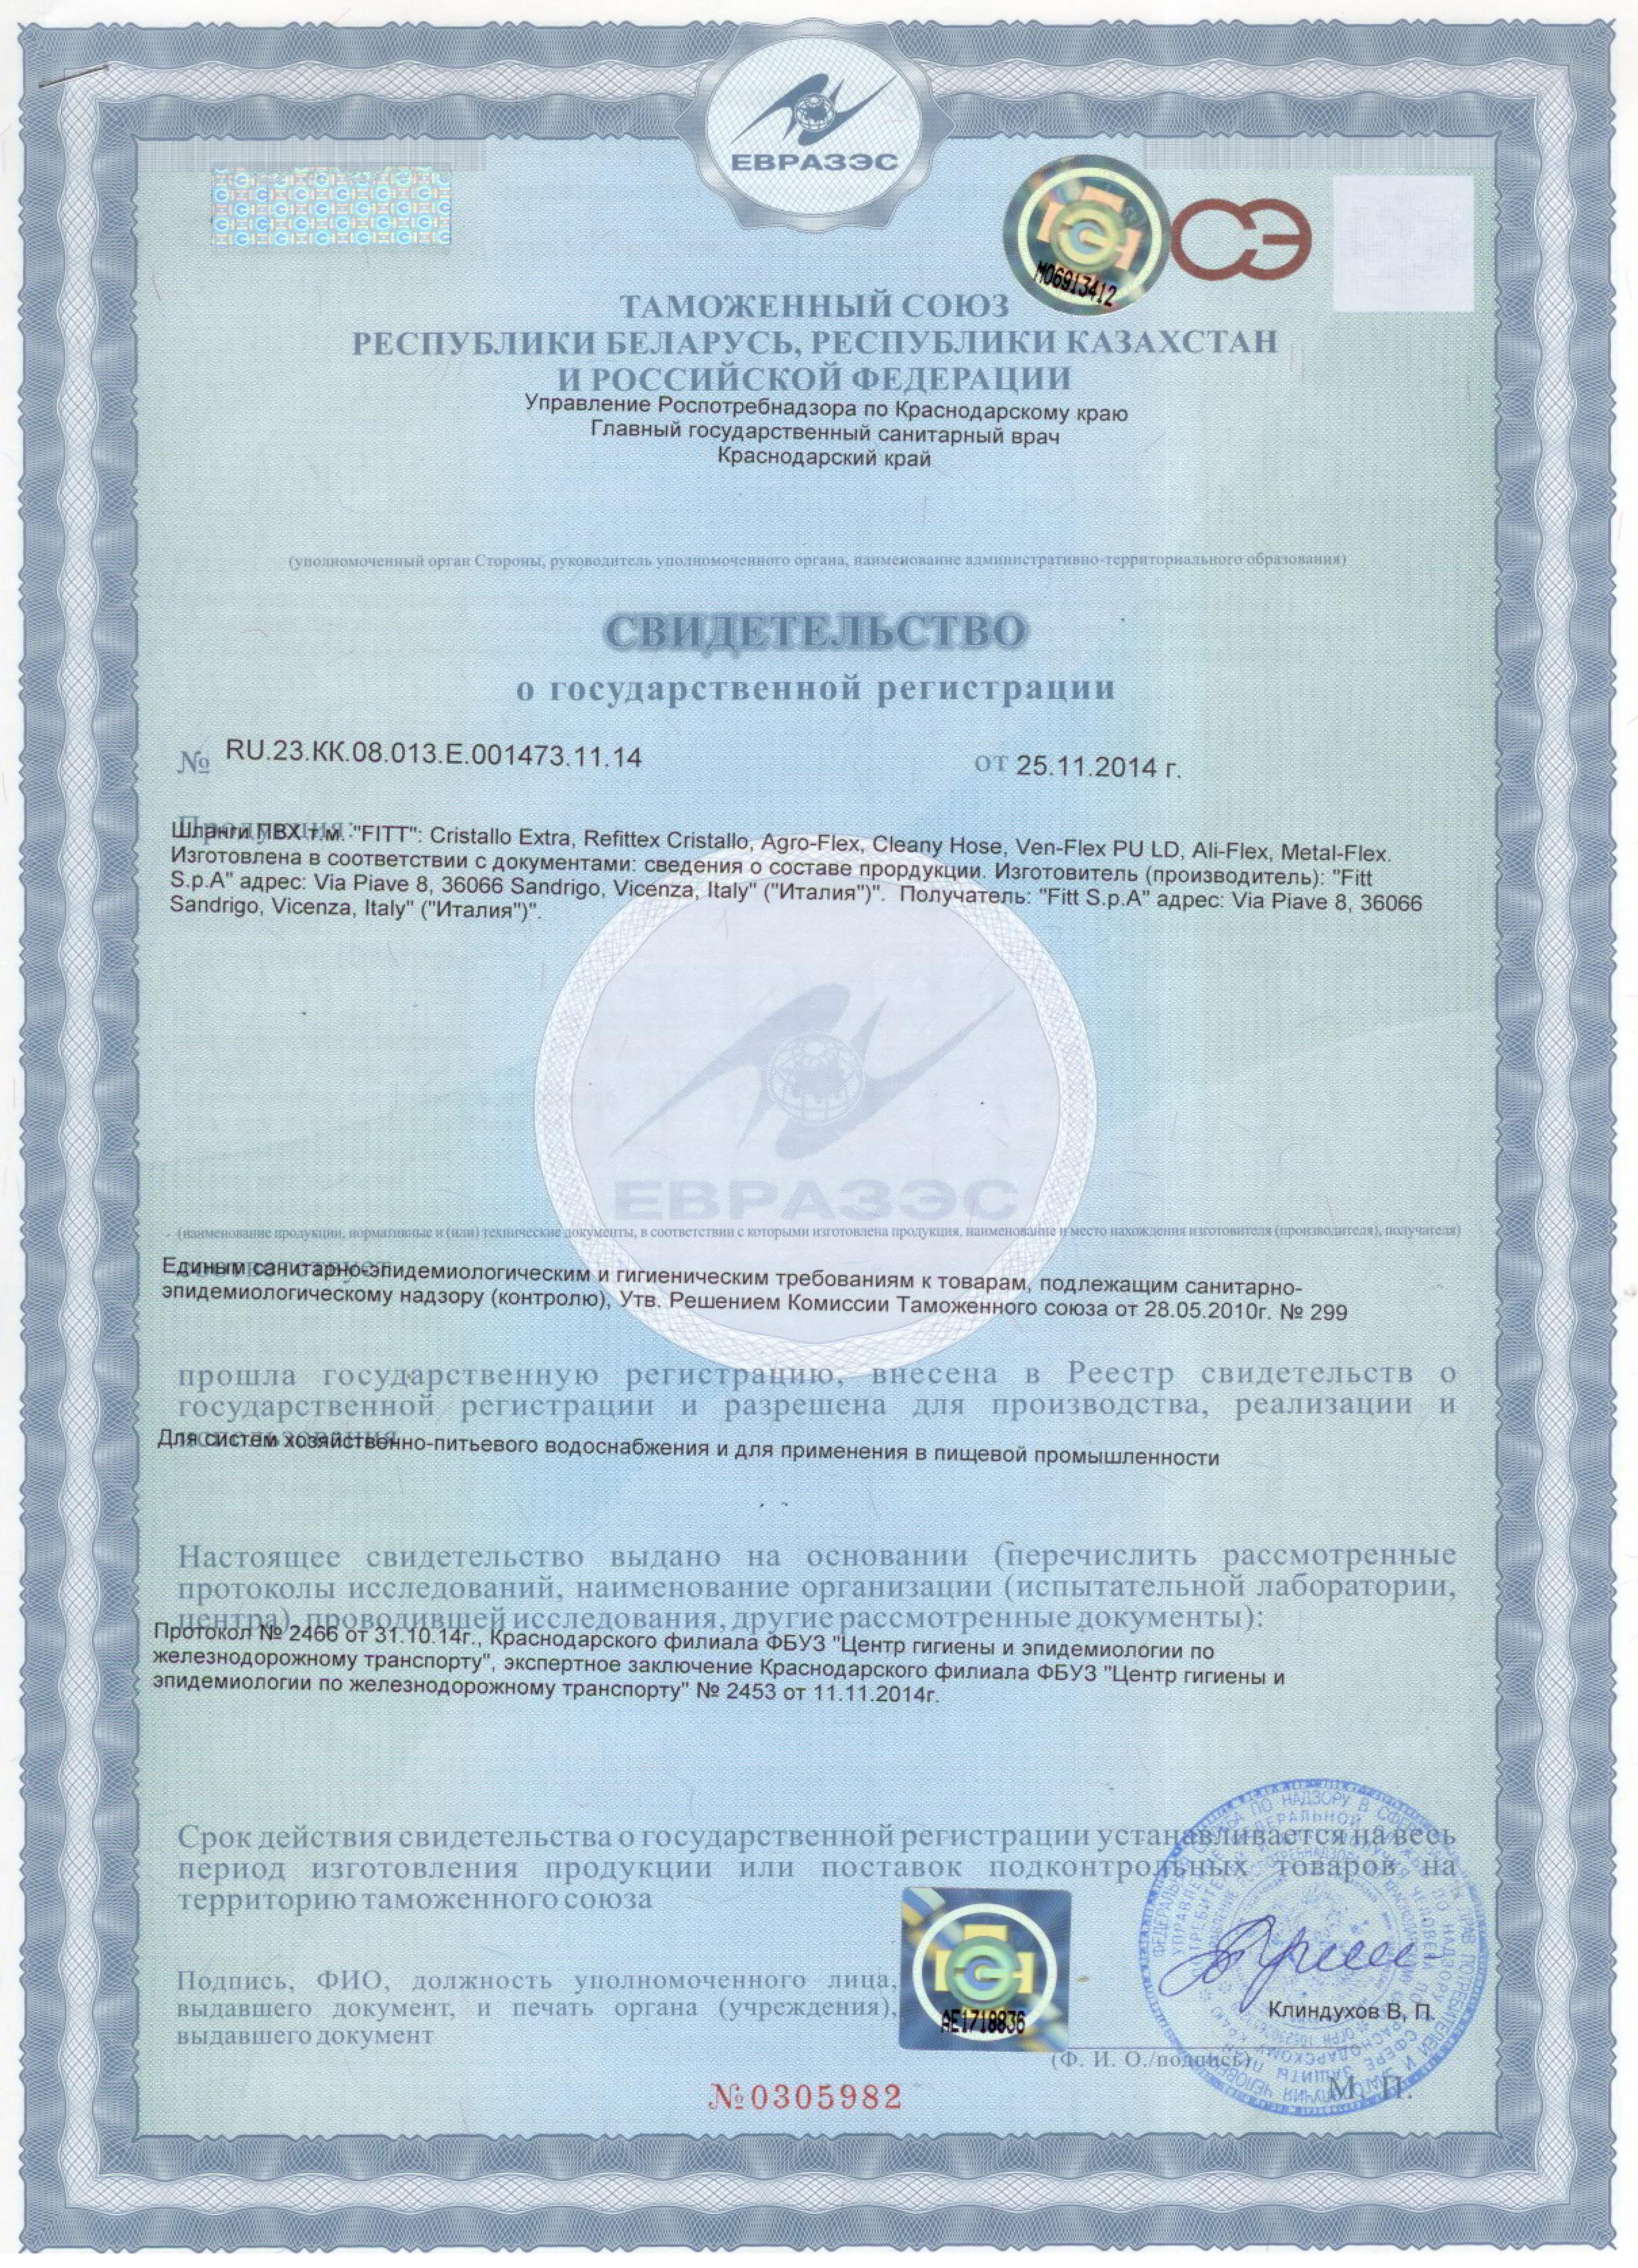 State_registration_Certificate_-_Russia-5.jpg